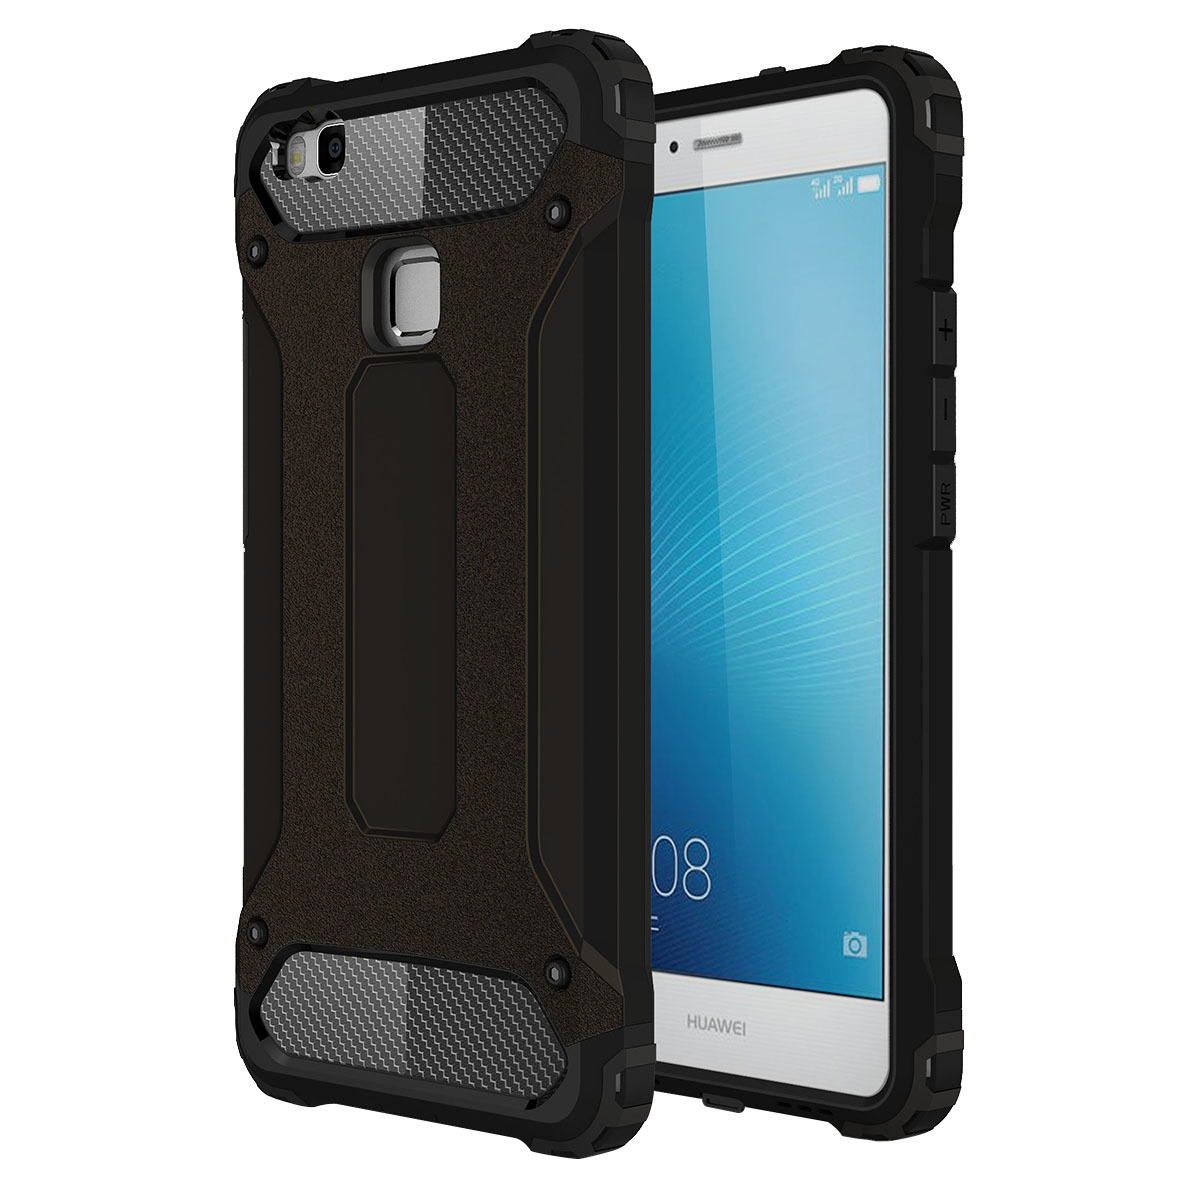 Moonmini Ultra Slim Lightweight Source Hybrid Armor Back Case Cover for Huawei P9 .